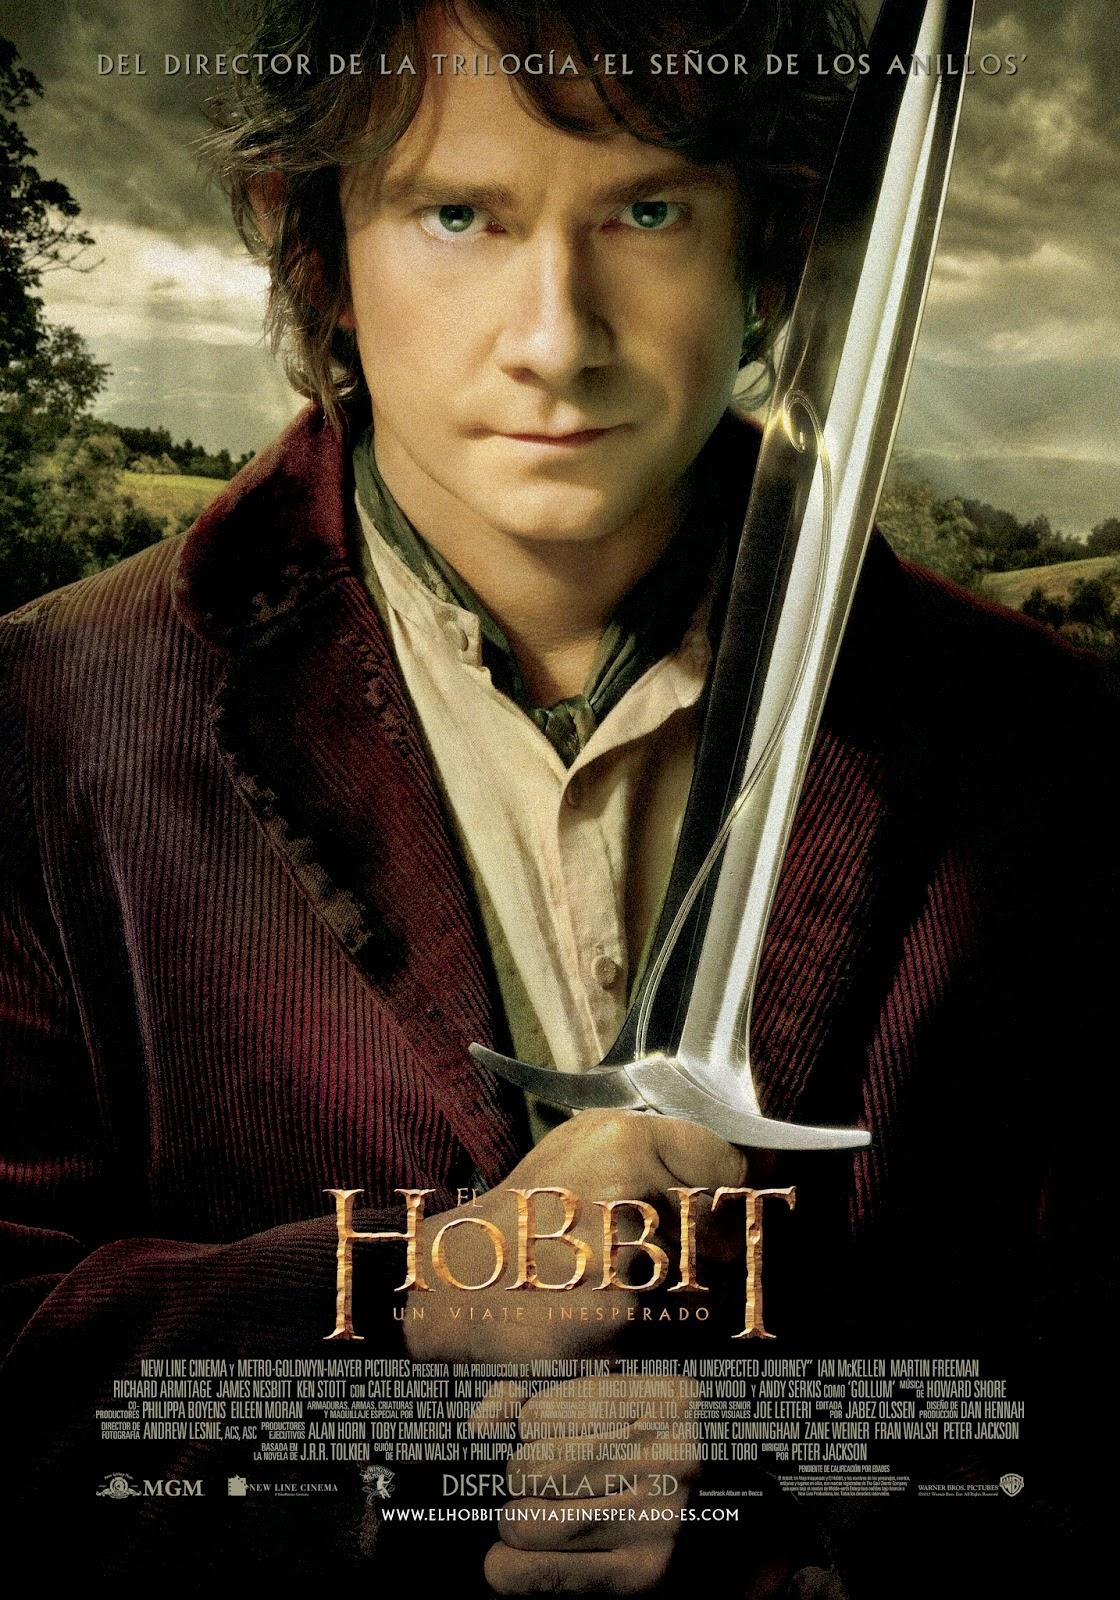 http://descubrepelis.blogspot.com/2013/12/el-hobbit-un-viaje-inesperado.html